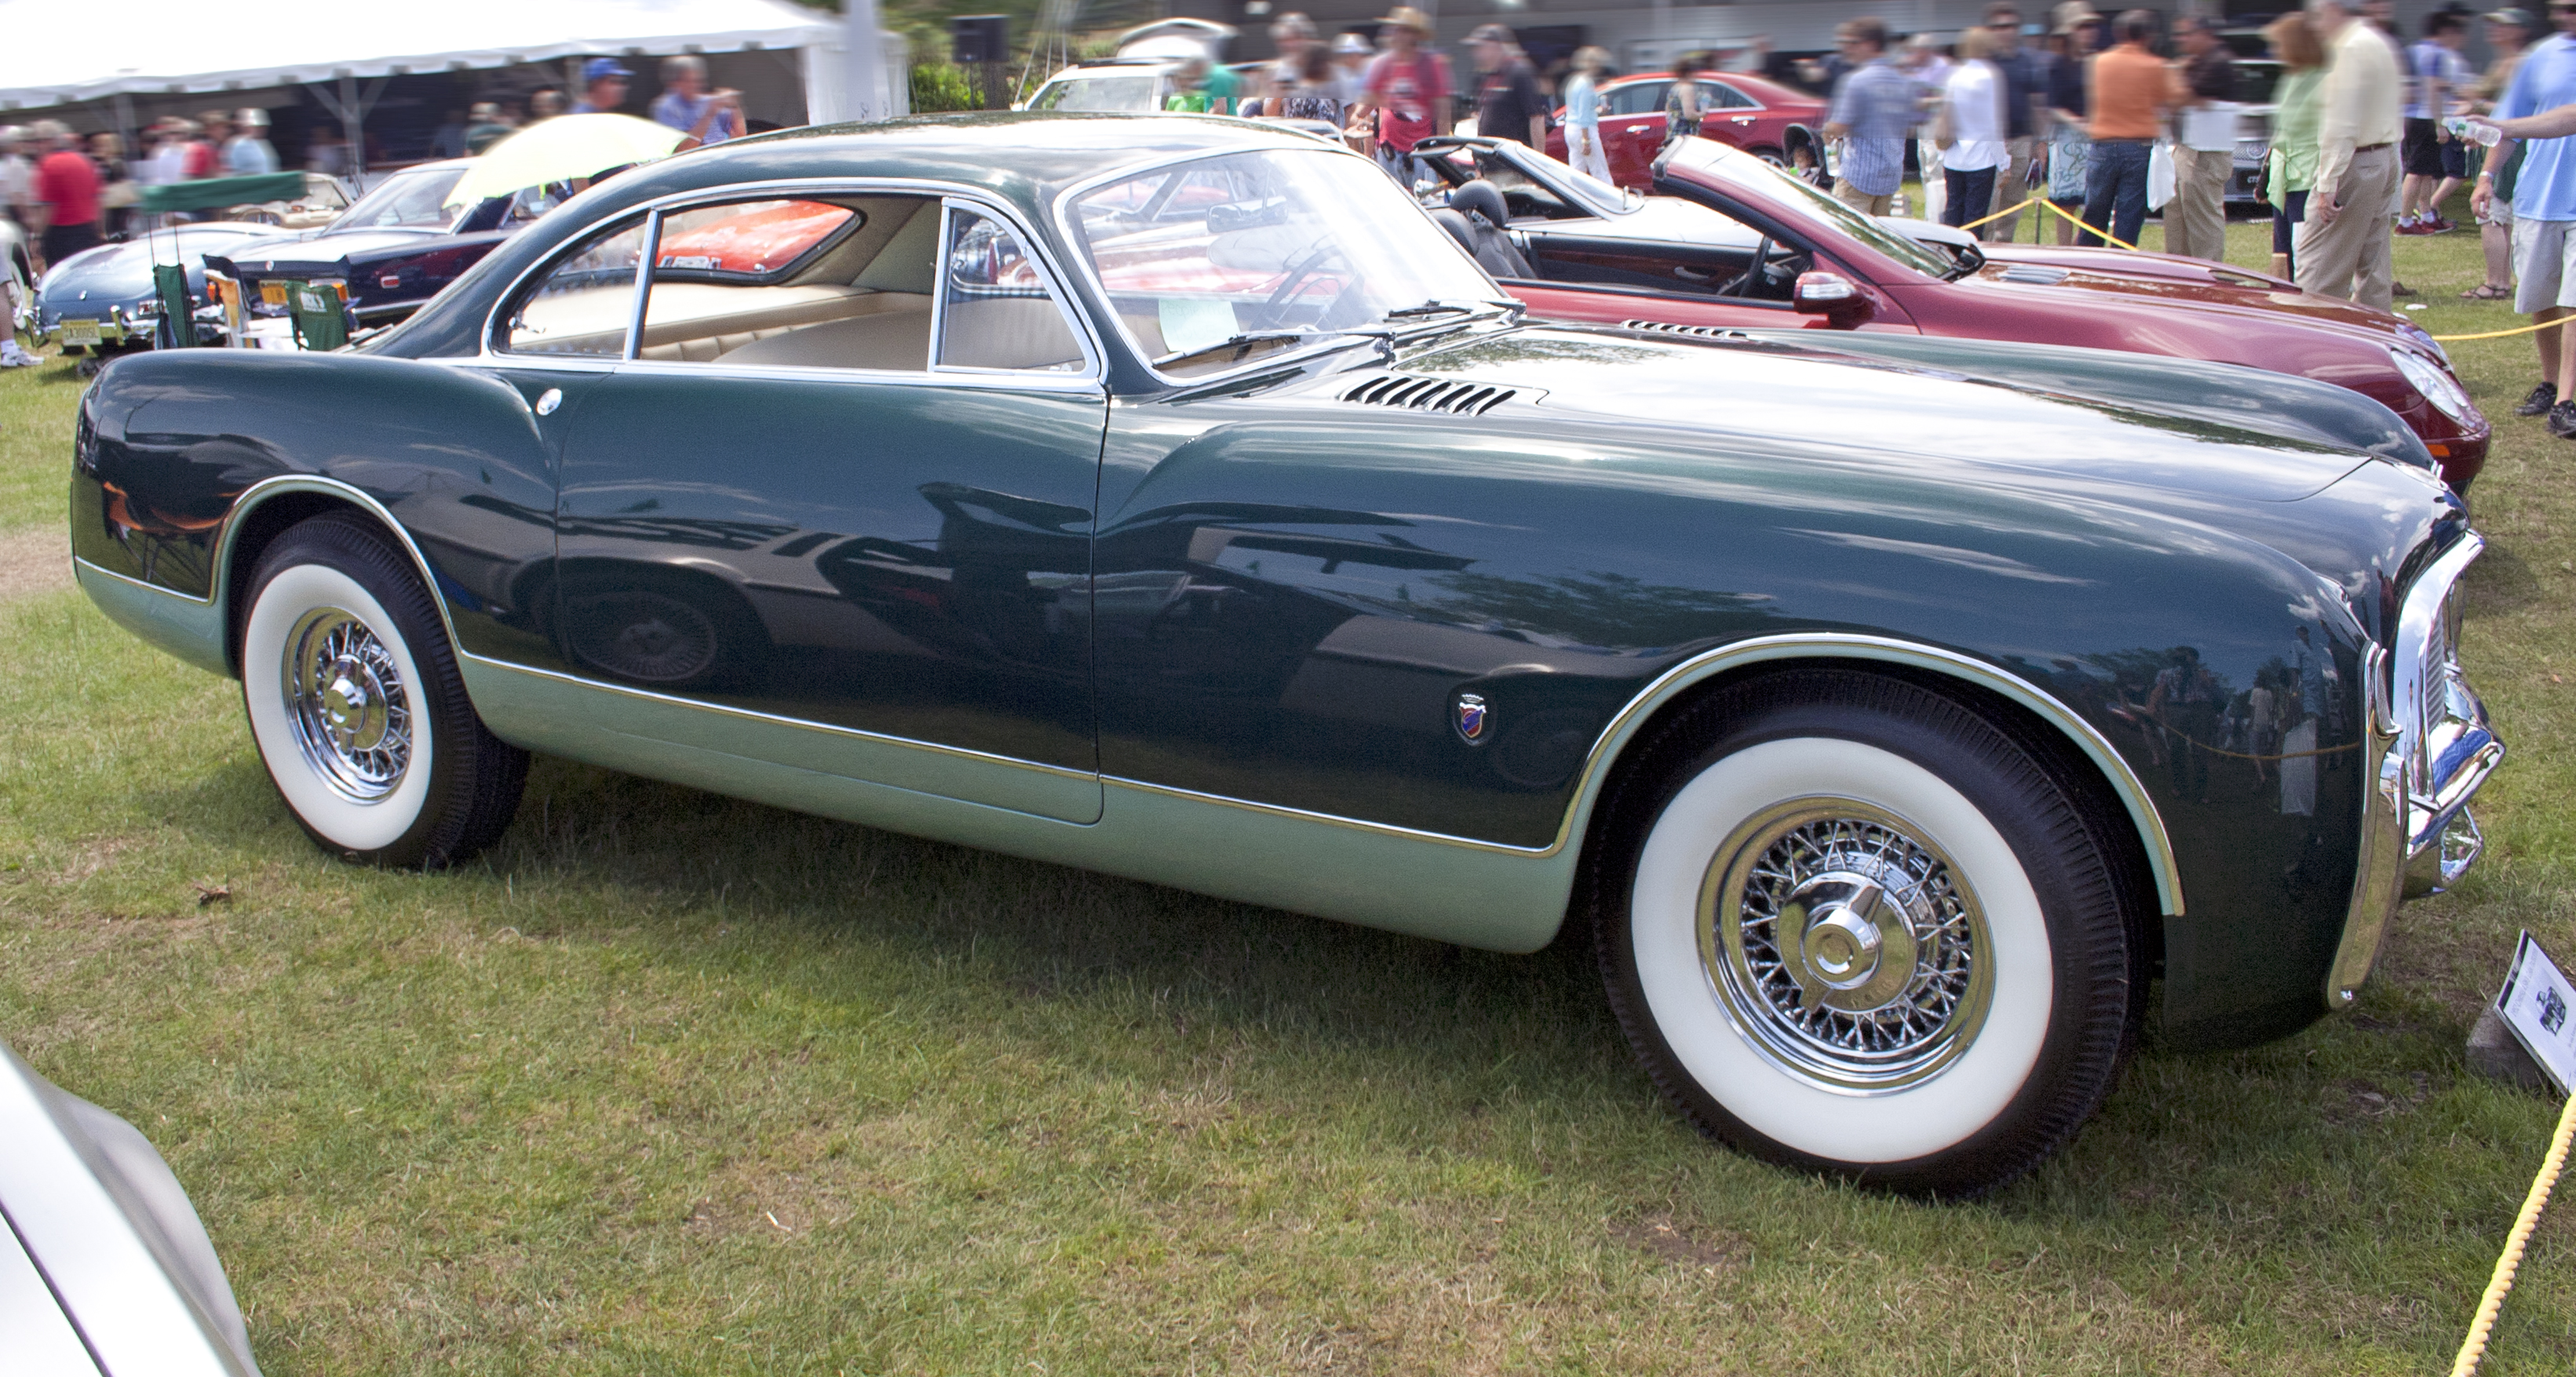 File:1952 Chrysler Ghia SWB proto.jpg - Wikimedia Commons